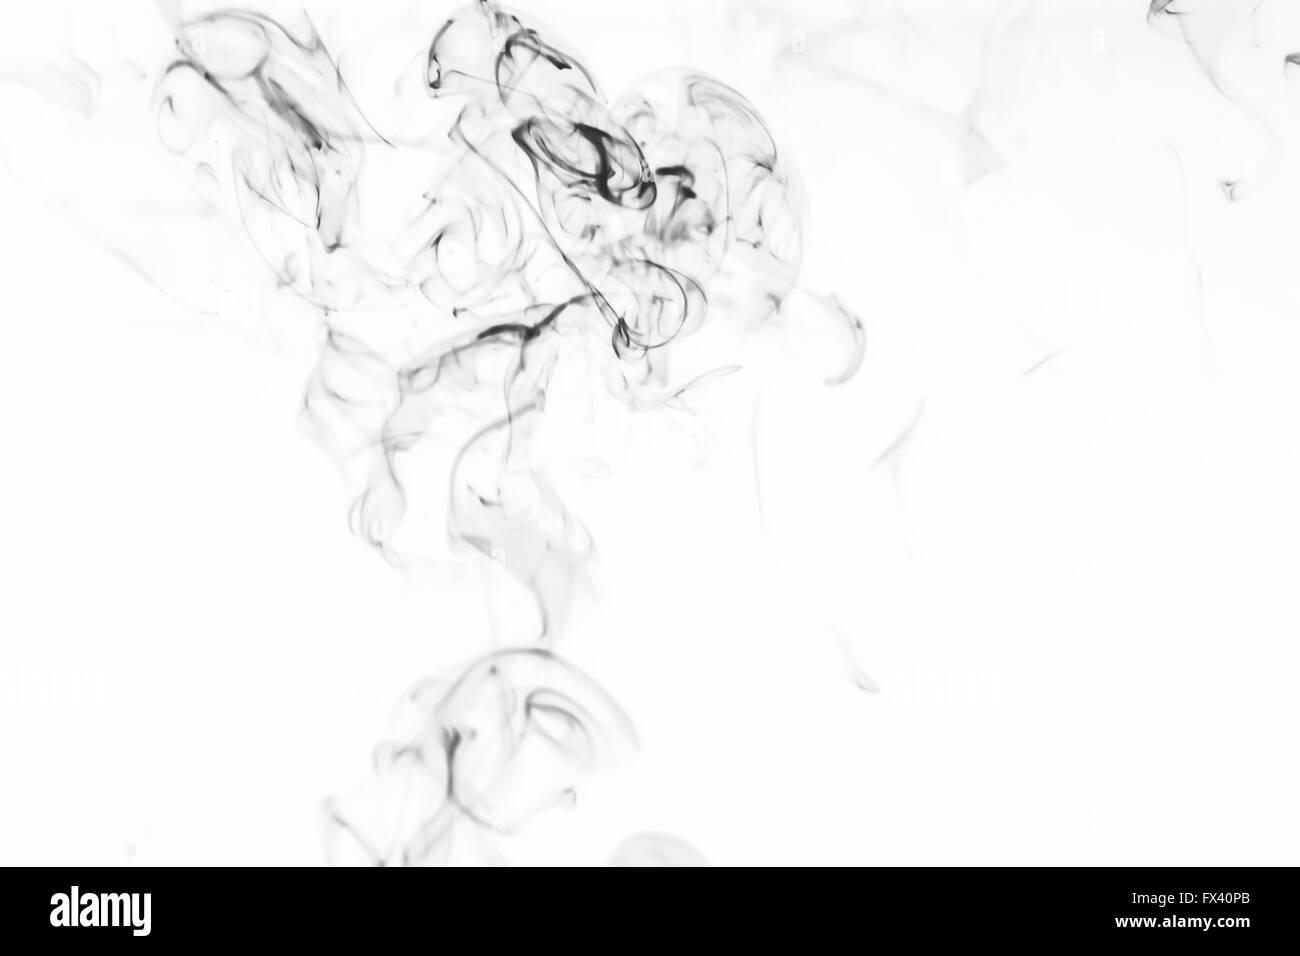 Silhouette is similar to smoke on white - Stock Image